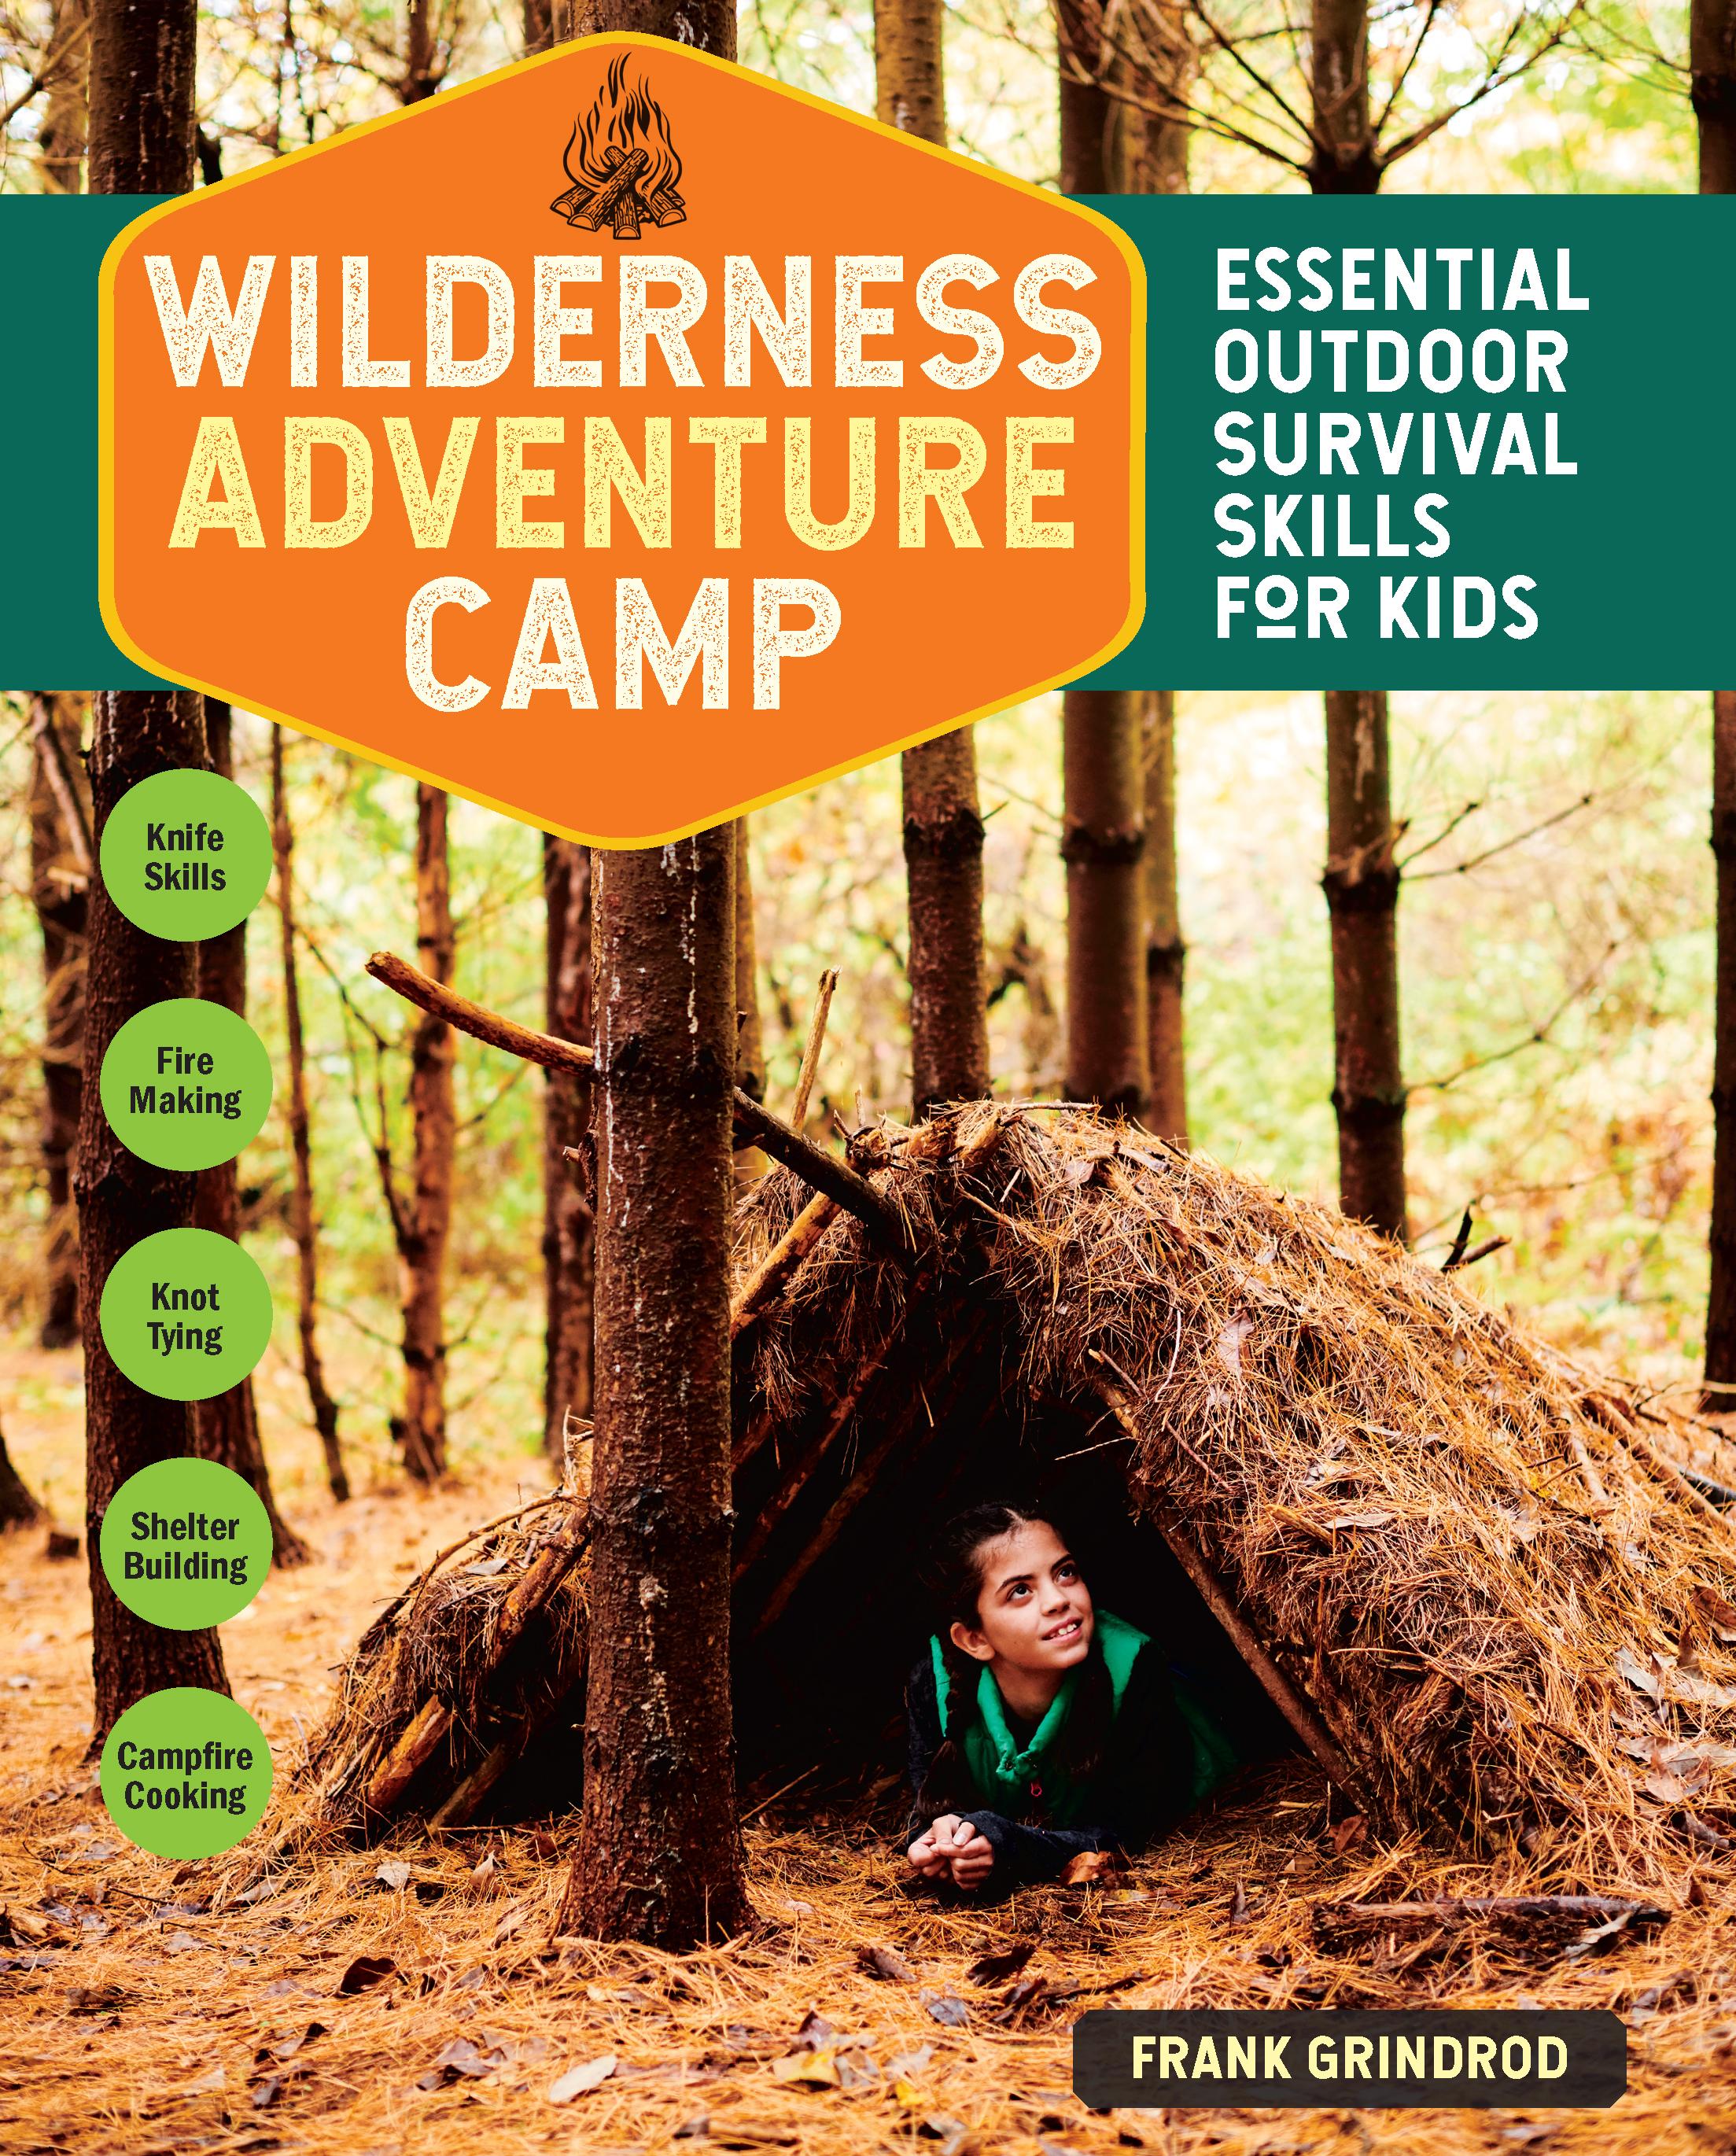 Wilderness Adventure Camp Essential Outdoor Survival Skills for Kids - Frank Grindrod